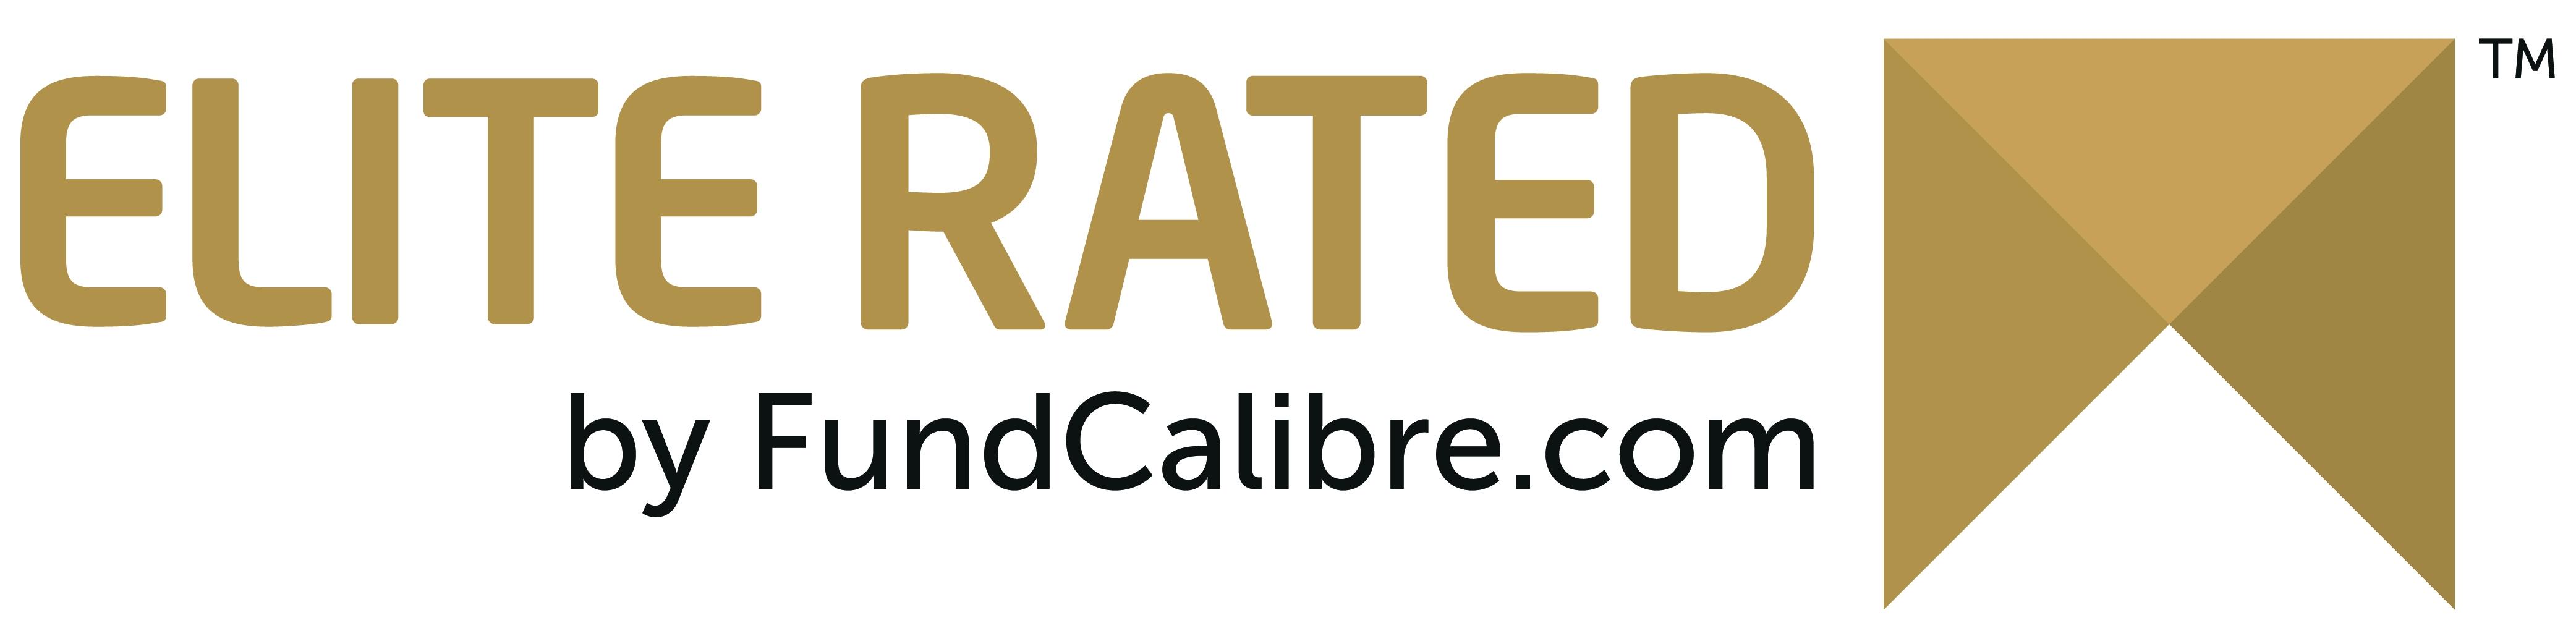 Elite Rating Logo Hq 002